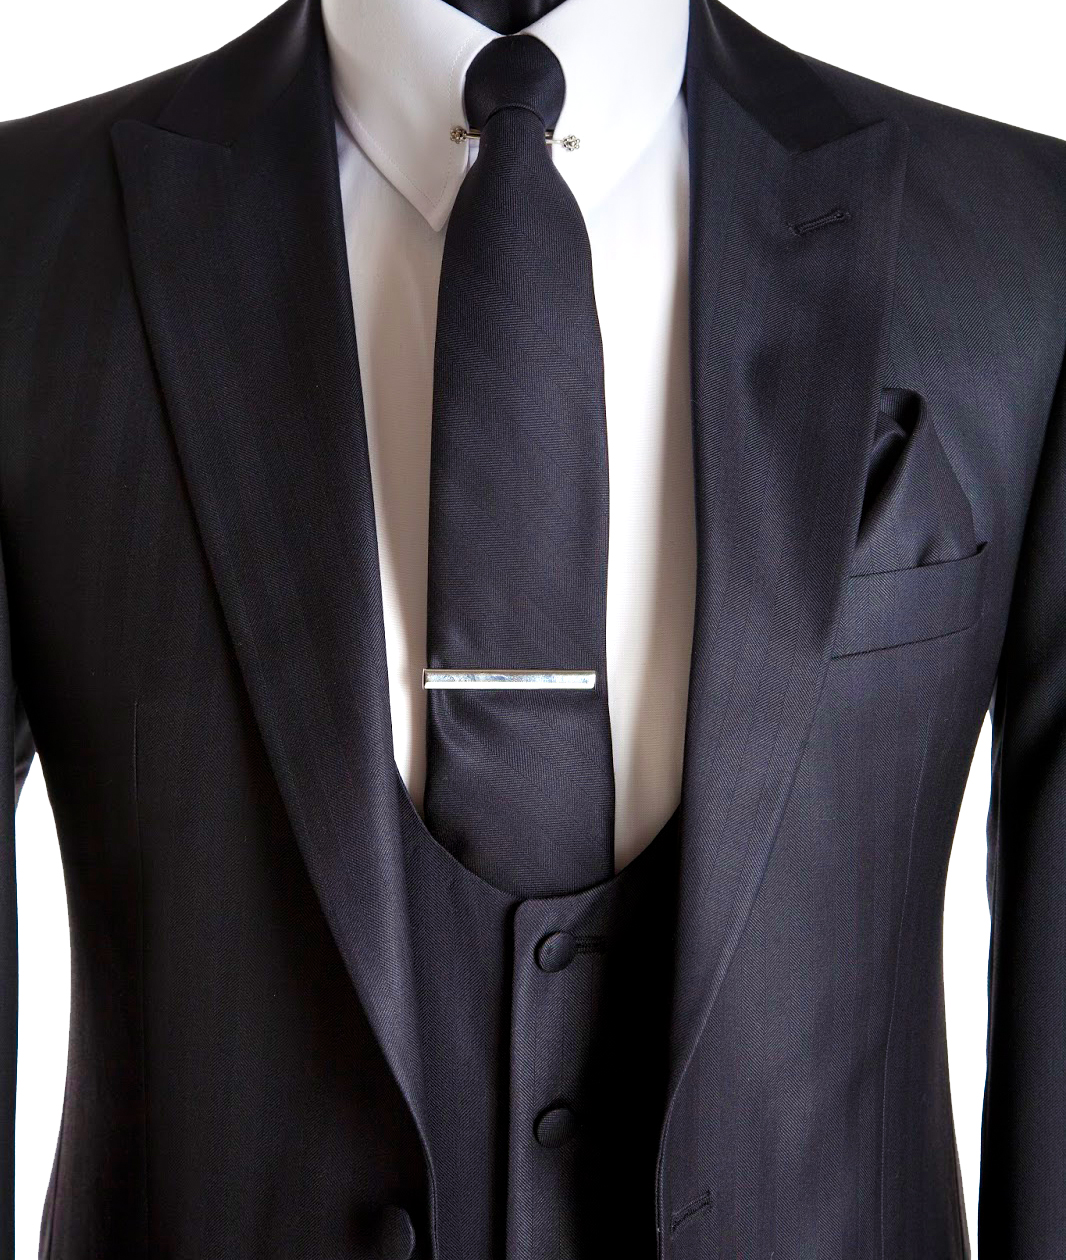 Tie clip looks great on suit